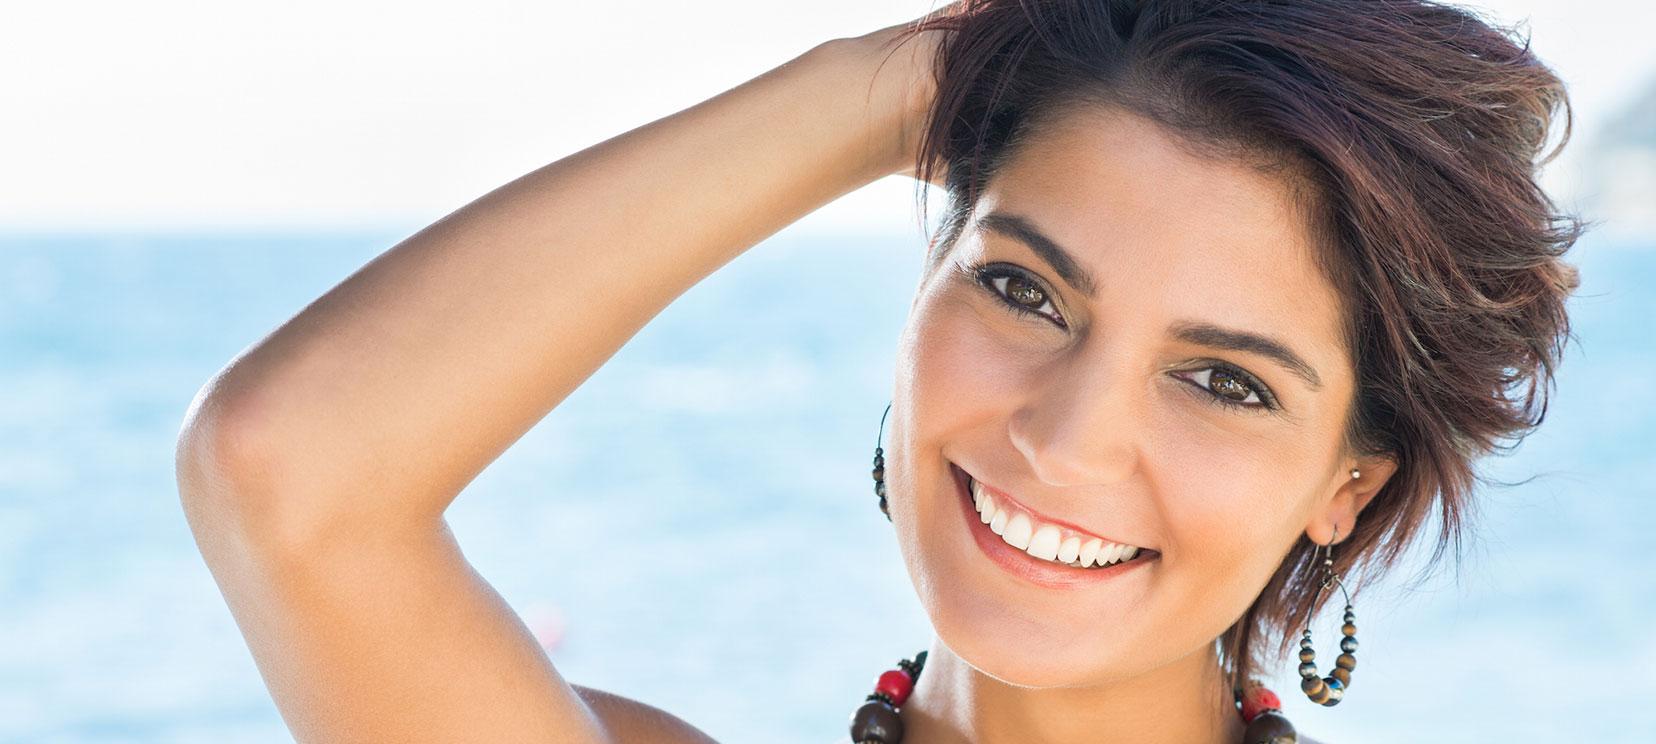 Happy Woman Smiling on Beach Beautiful Healthy Teeth